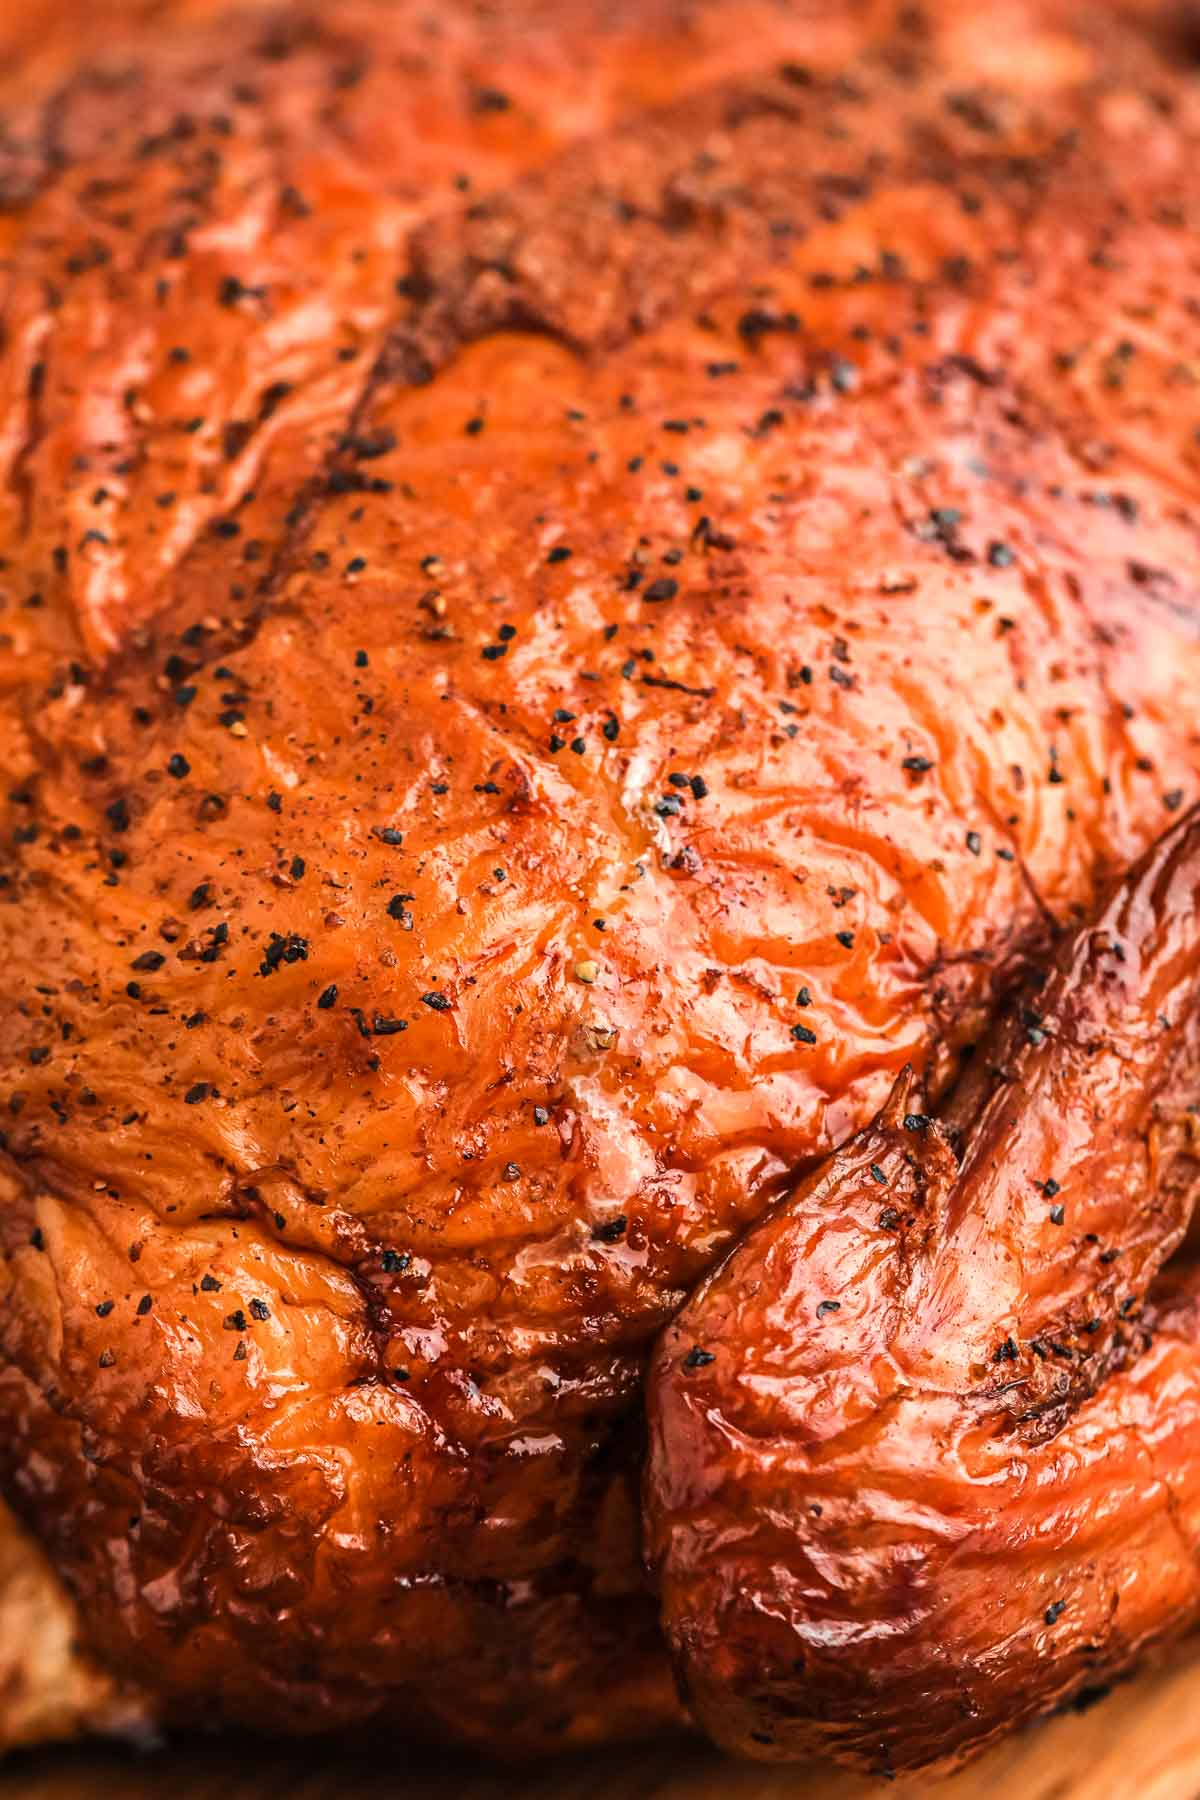 Close up shot of the smoked chicken crispy skin